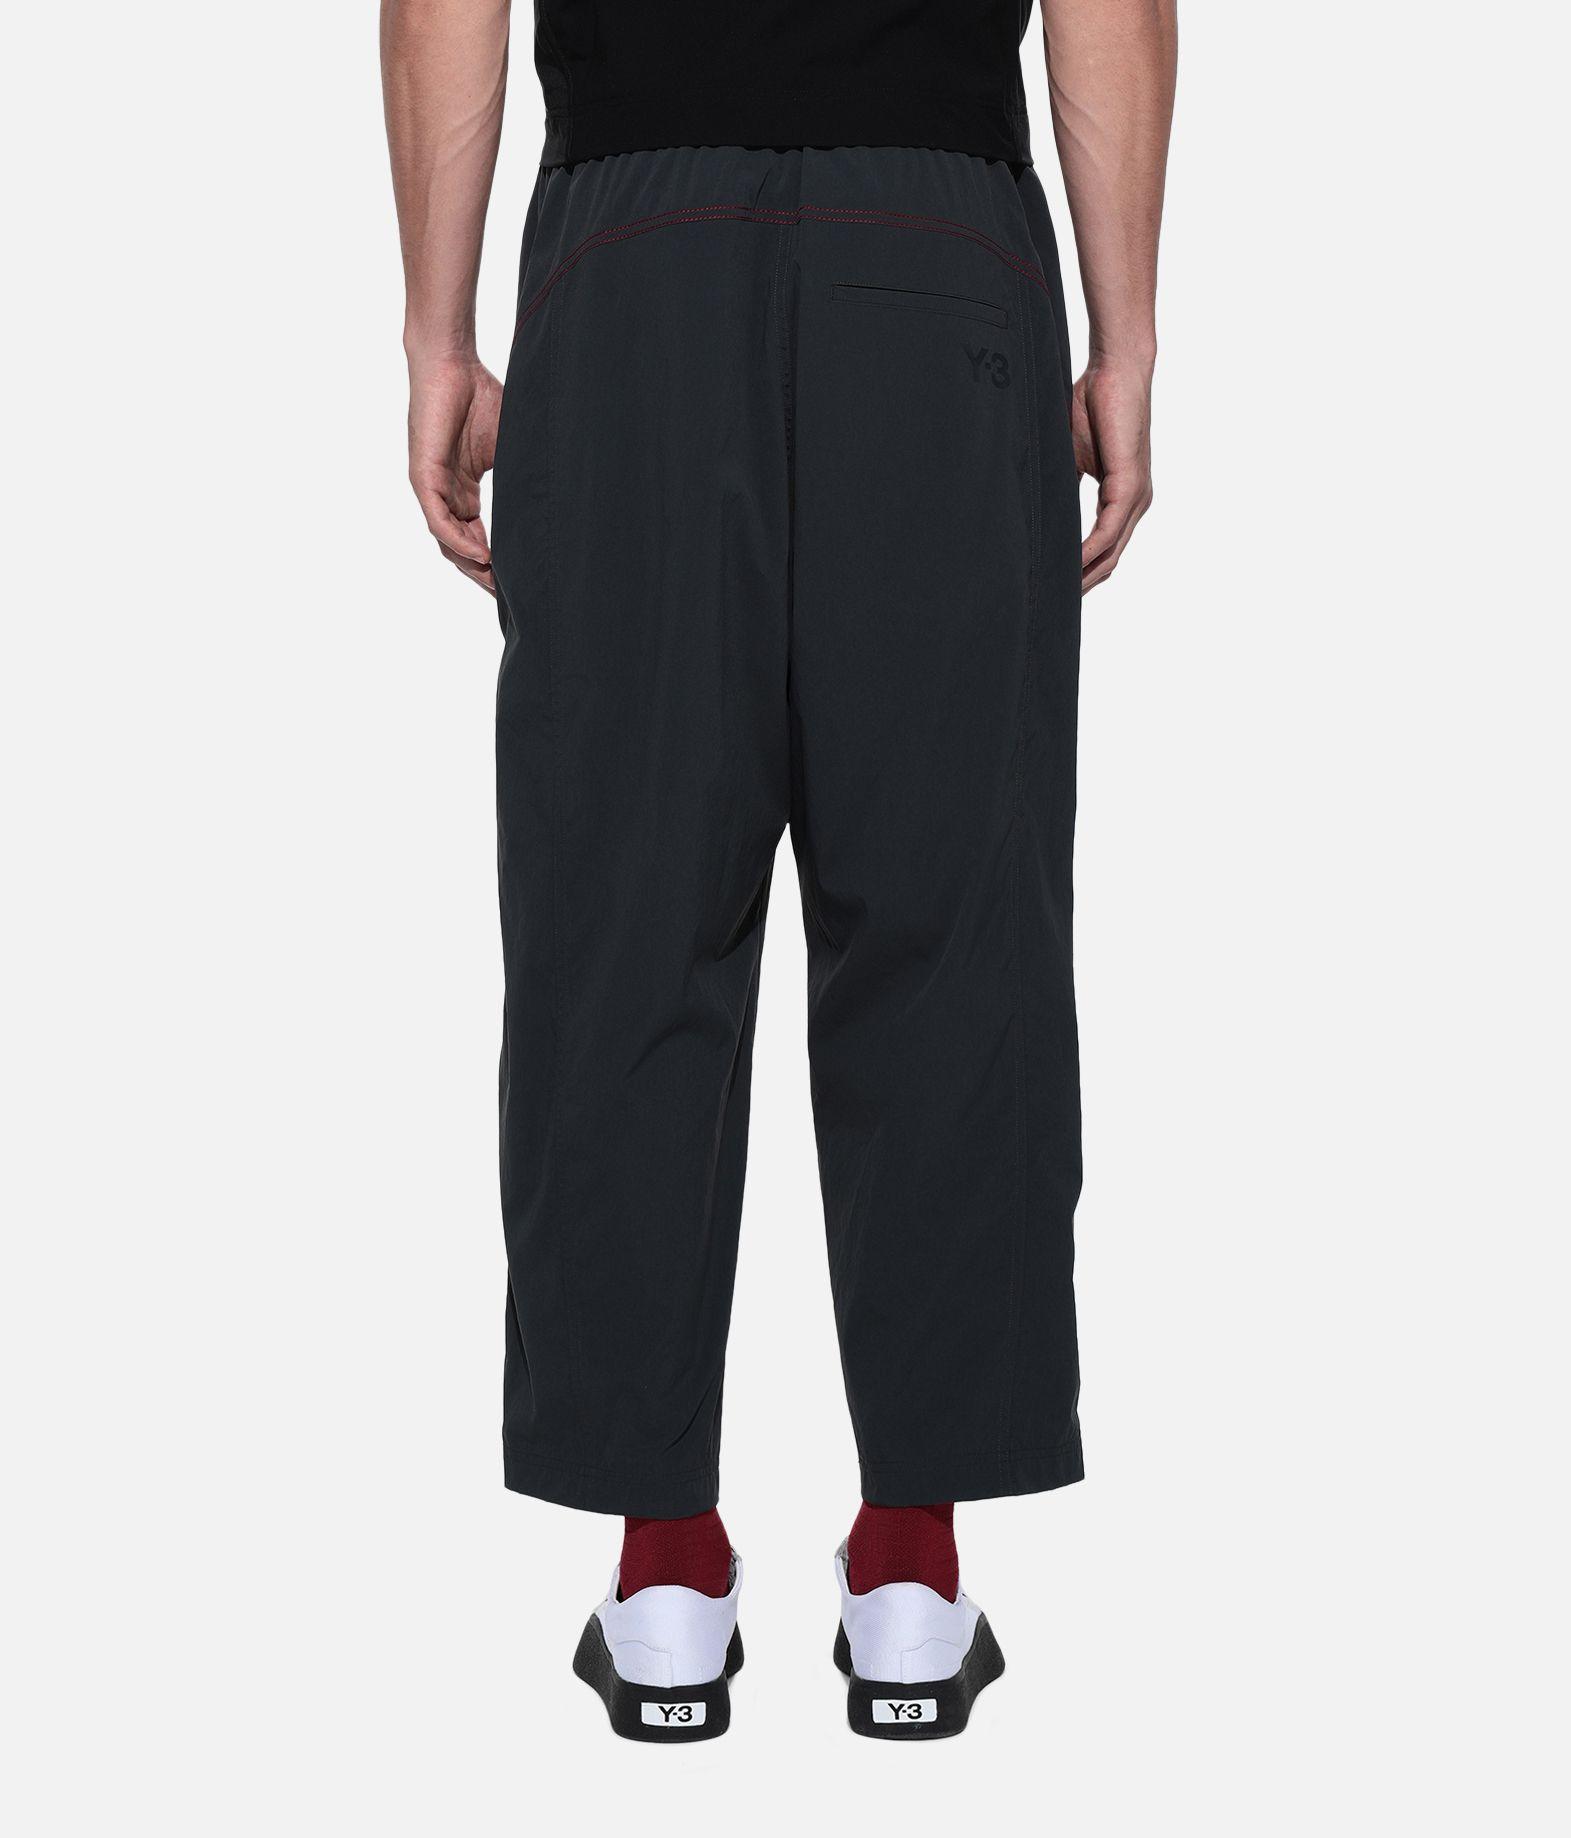 Y-3 Y-3 Luxe Track Pants Tracksuit pants Man d